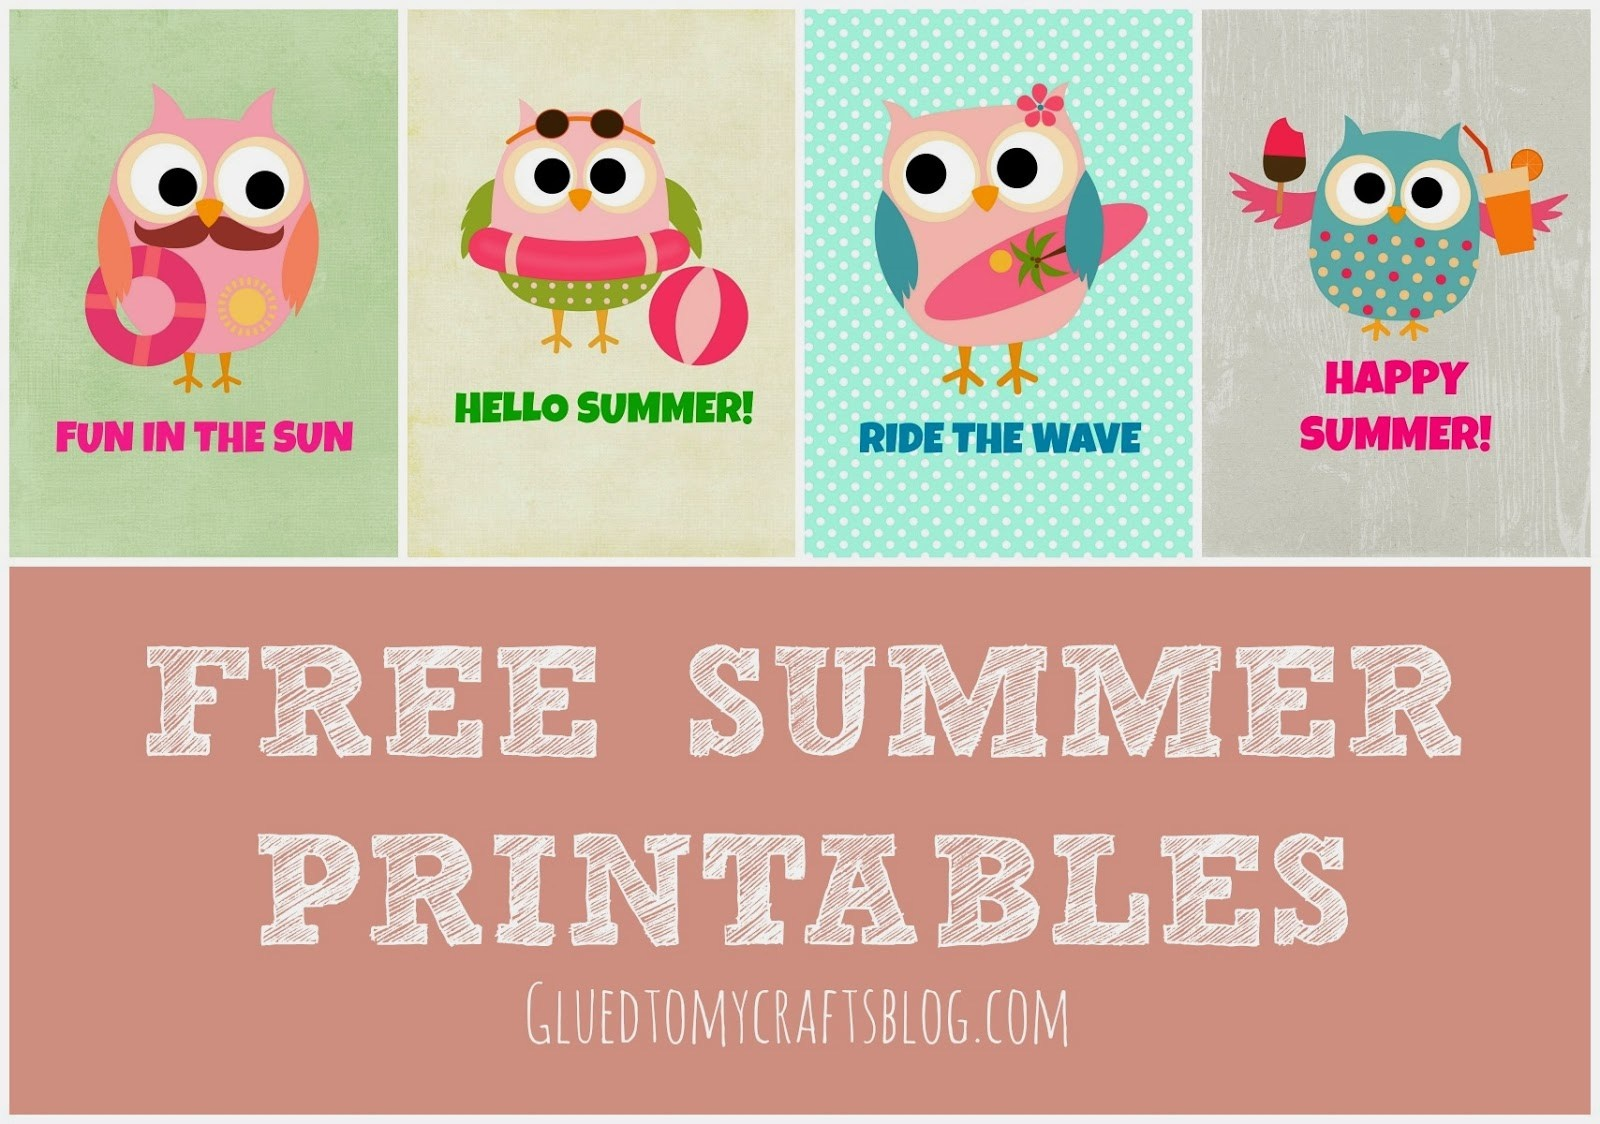 Free Summer Printables - Free Summer Printables